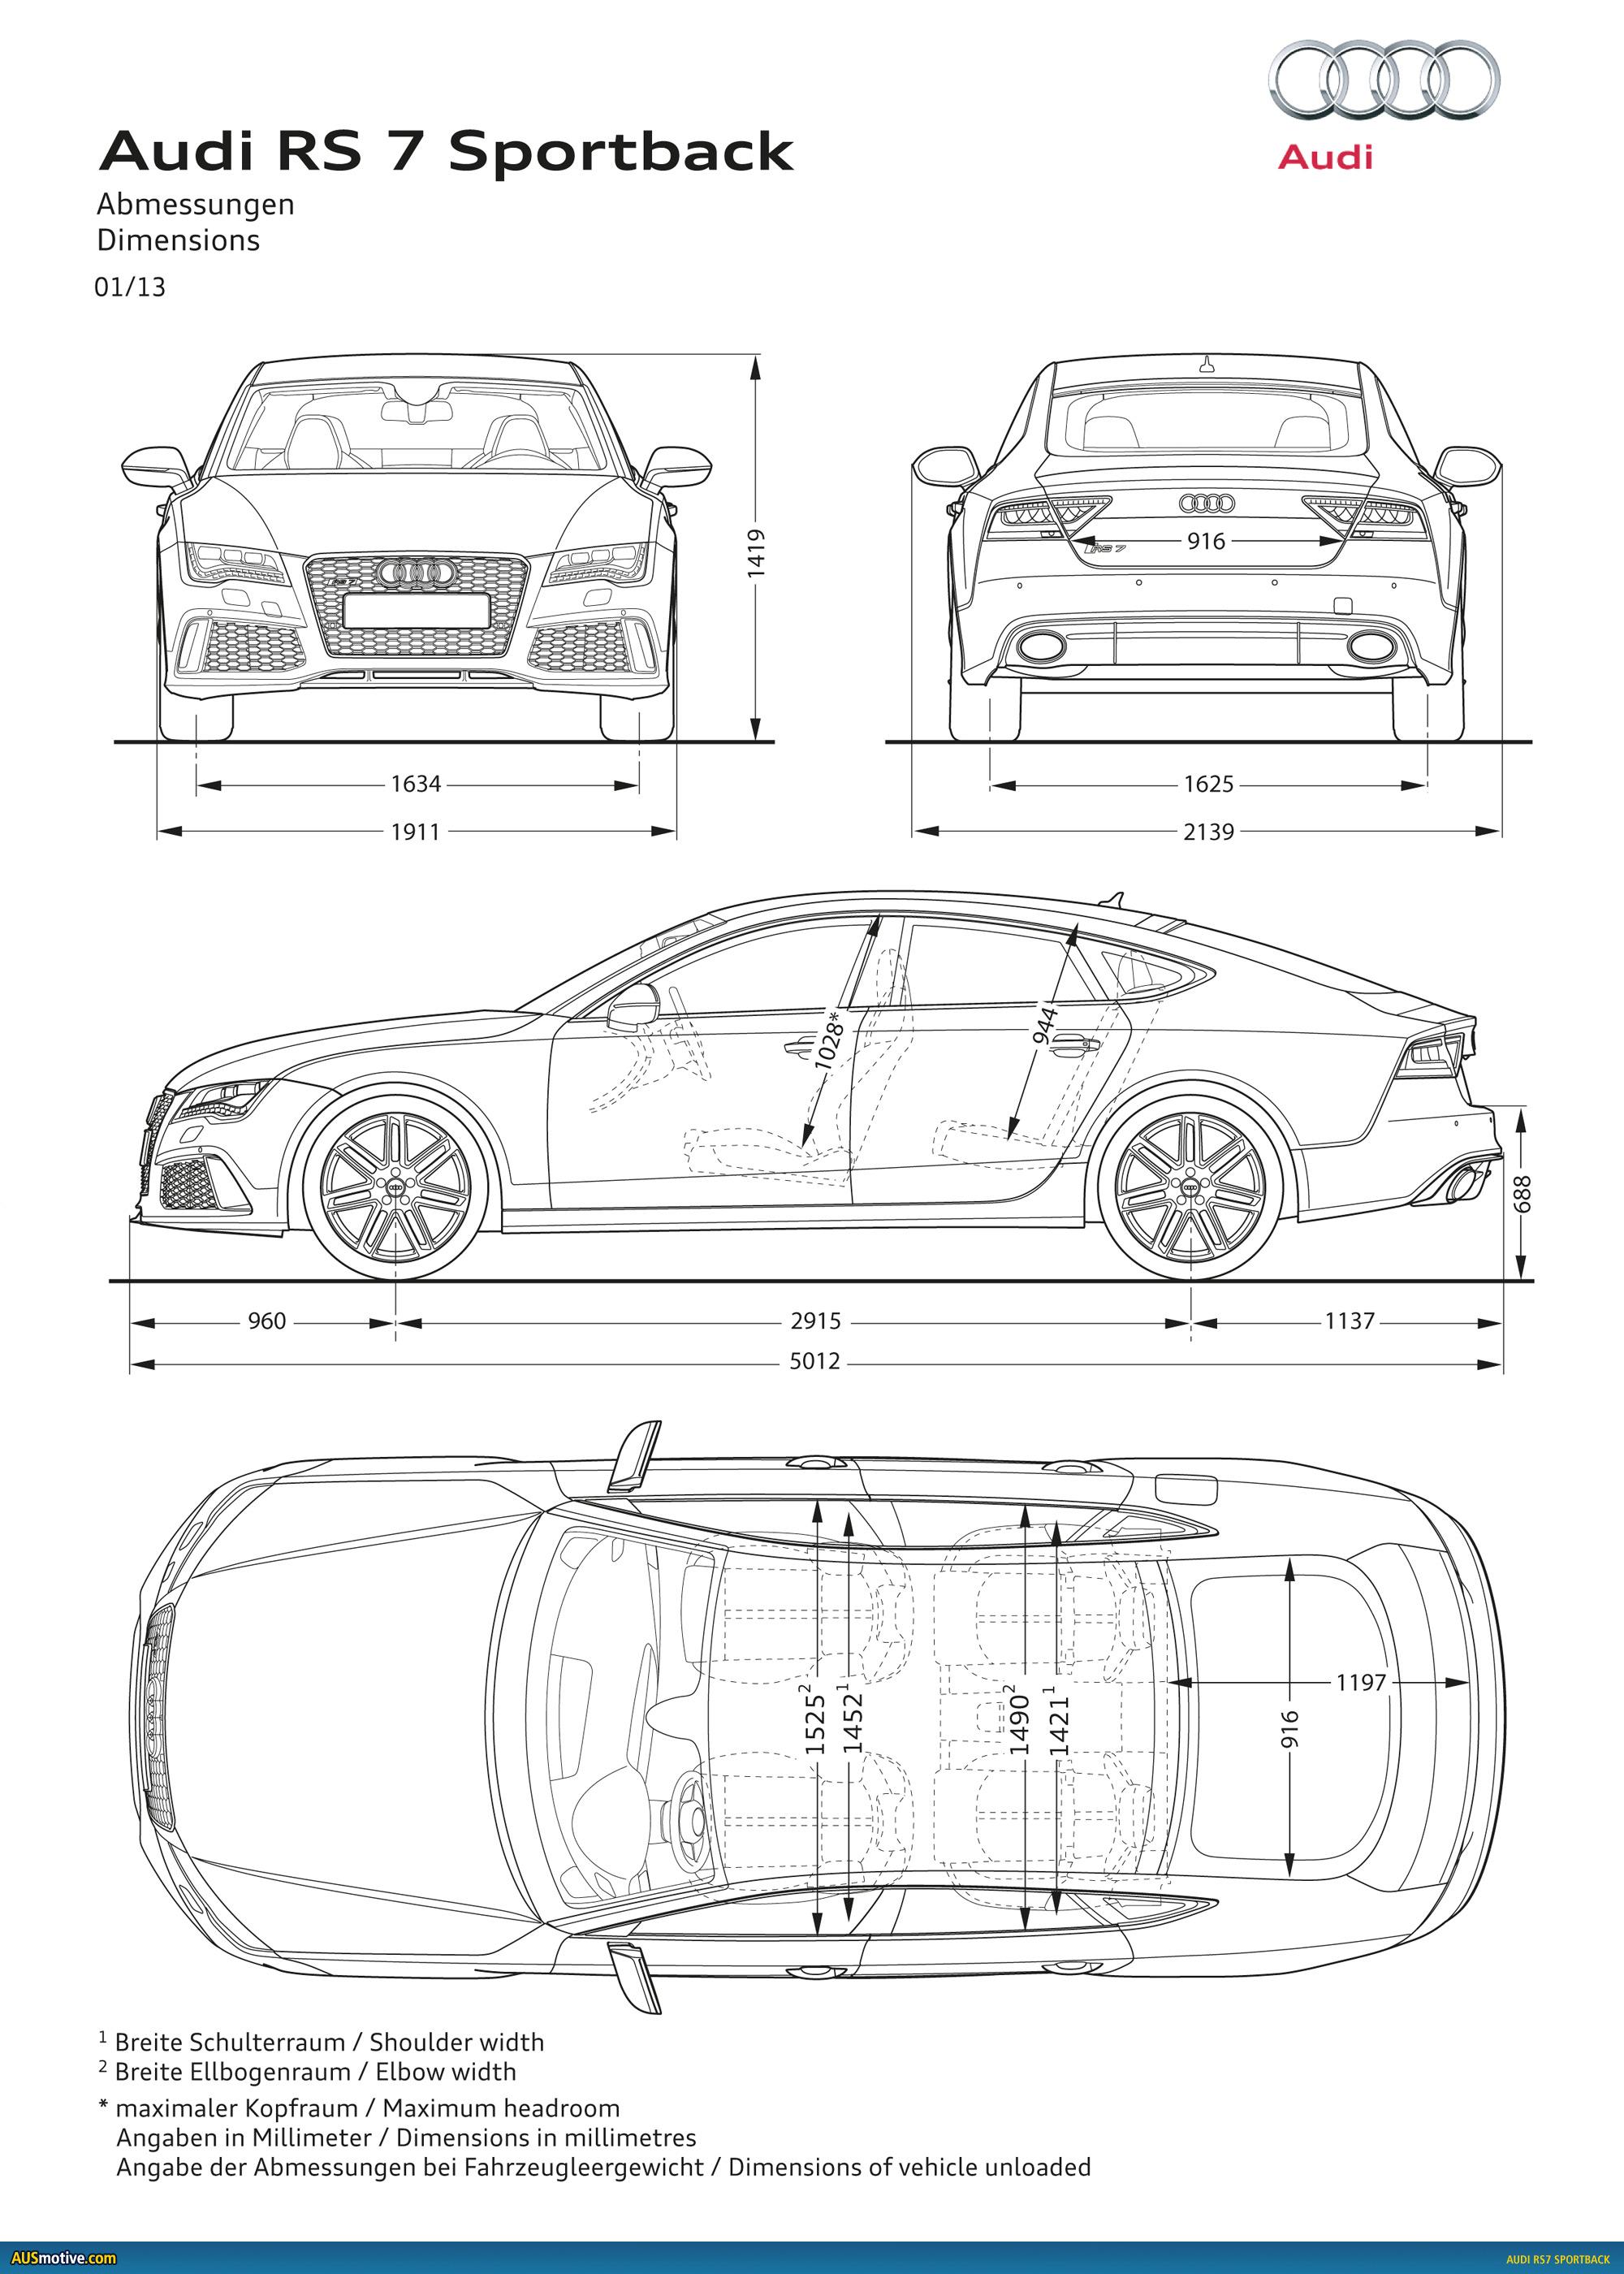 Ausmotive Detroit Audi Rs7 Sportback